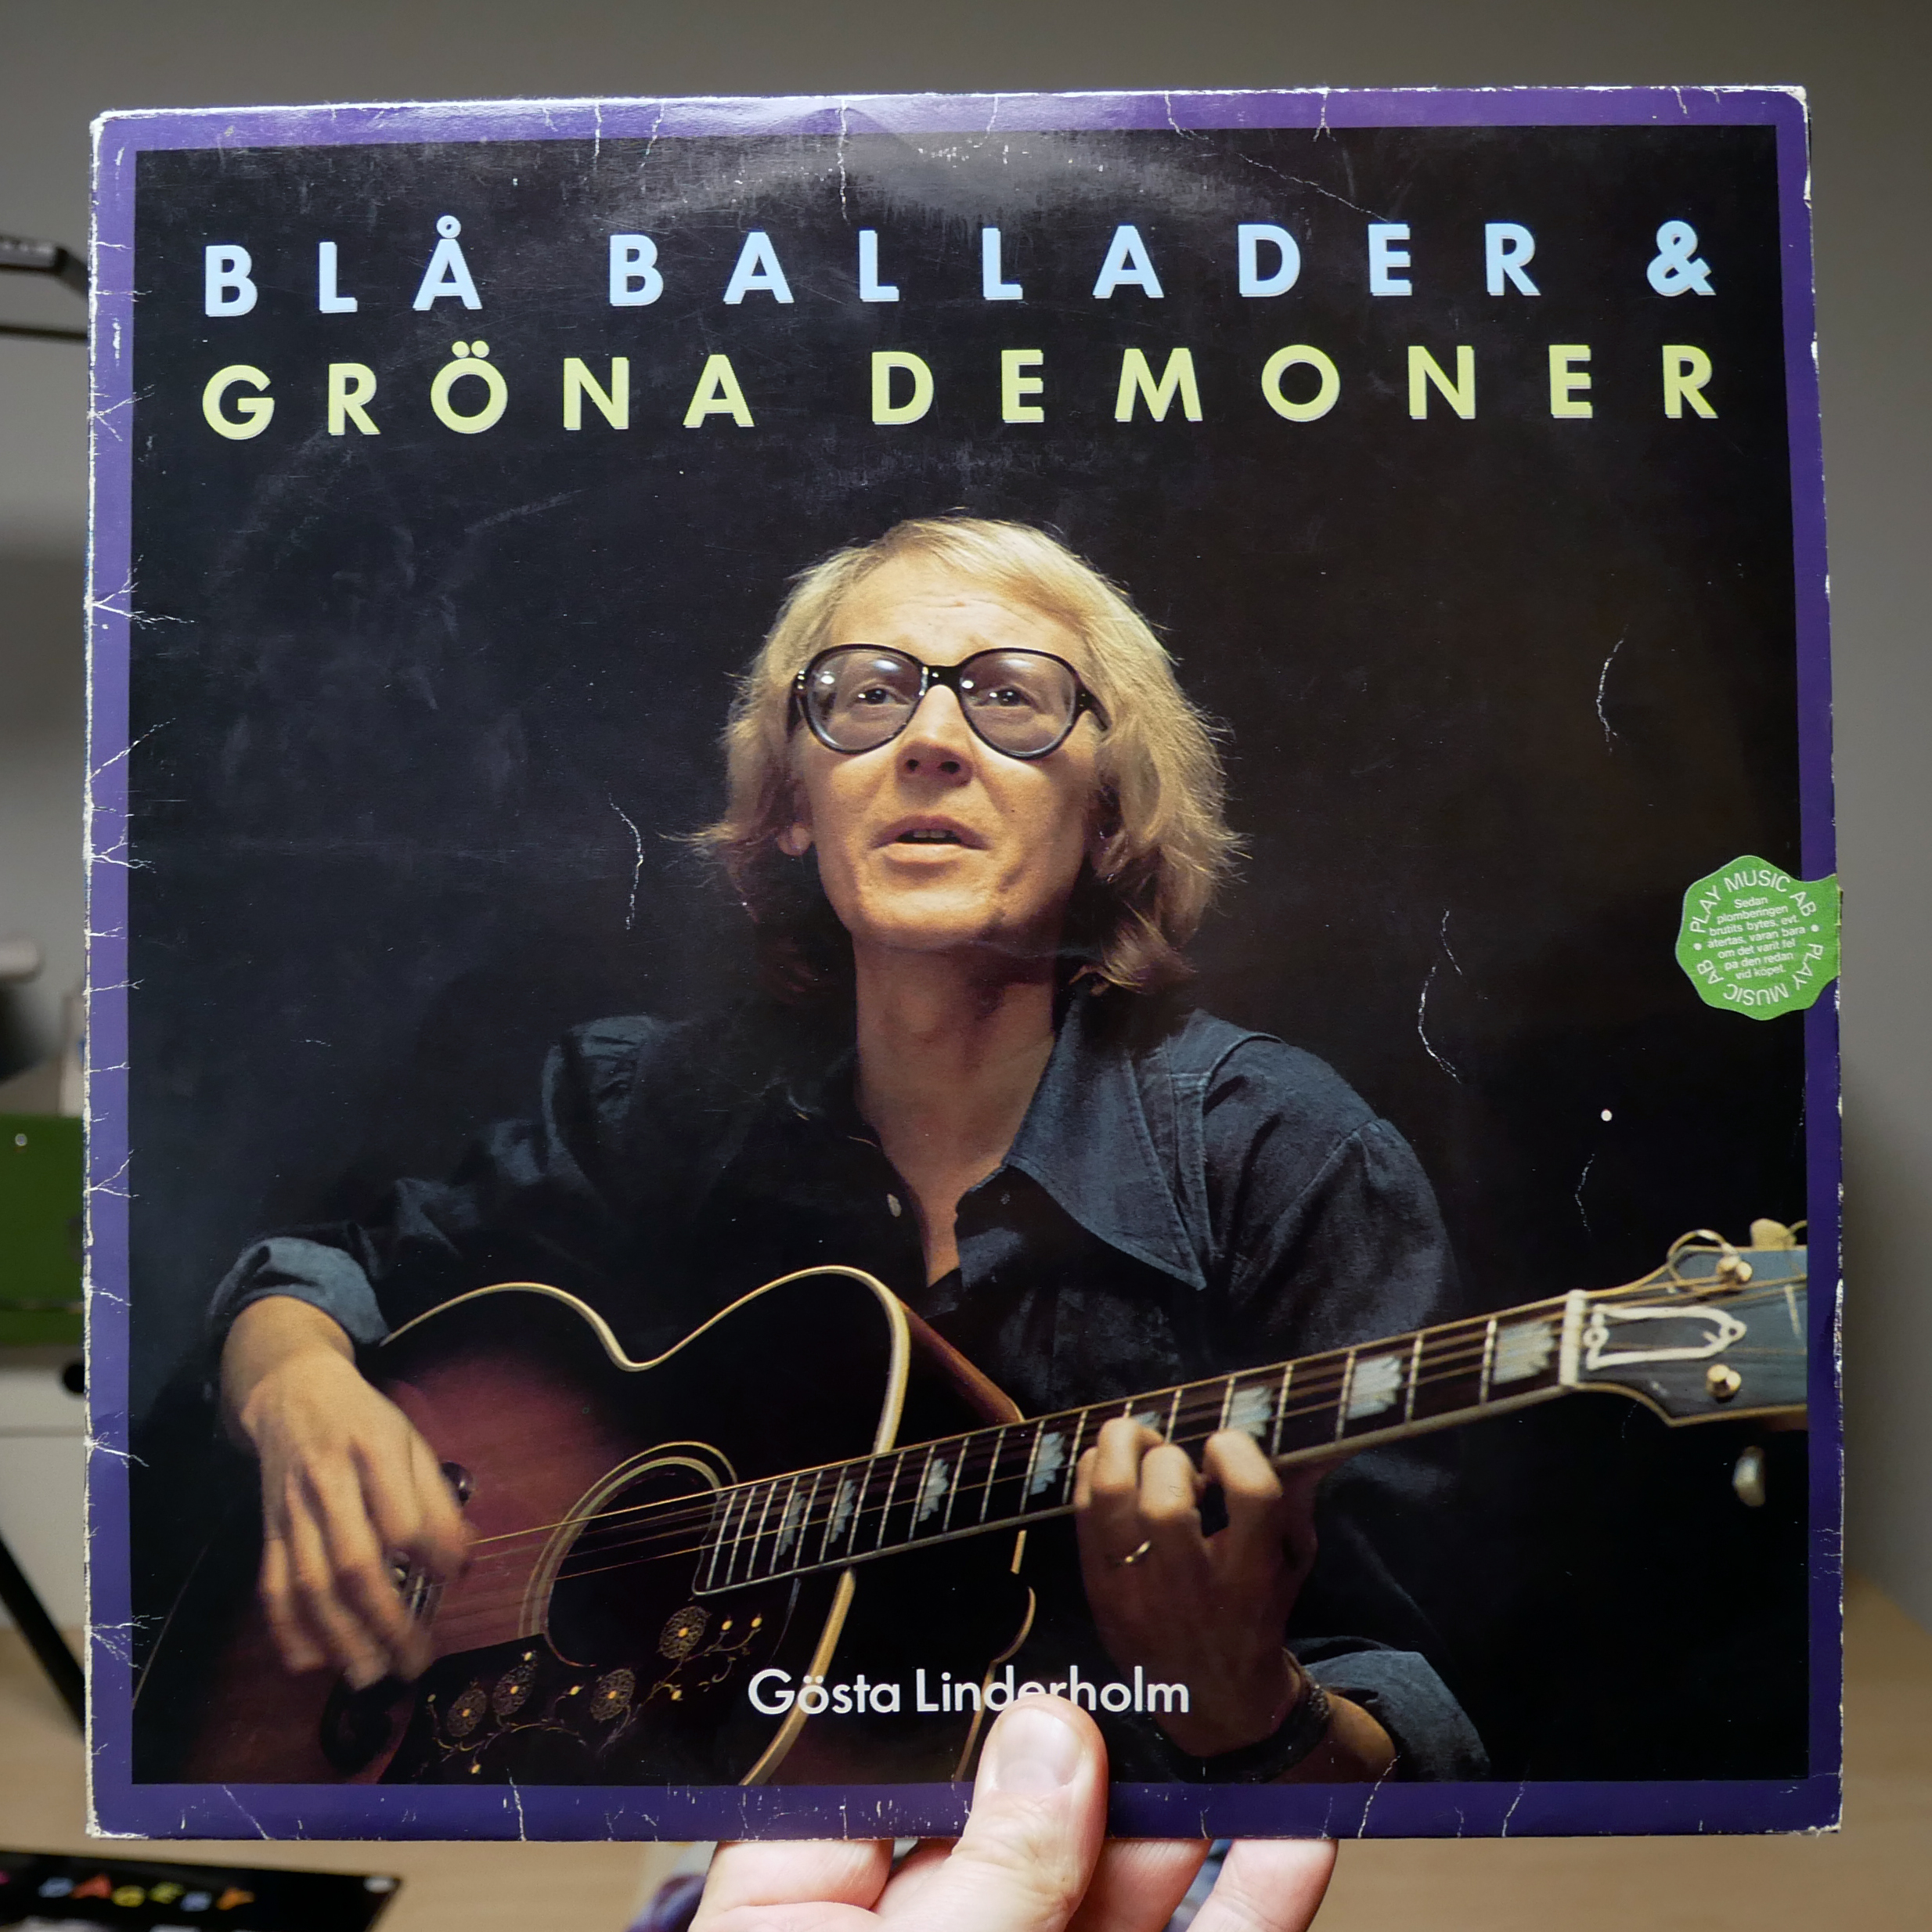 Gösta Linderholm –Blå ballader & Gröna demoner